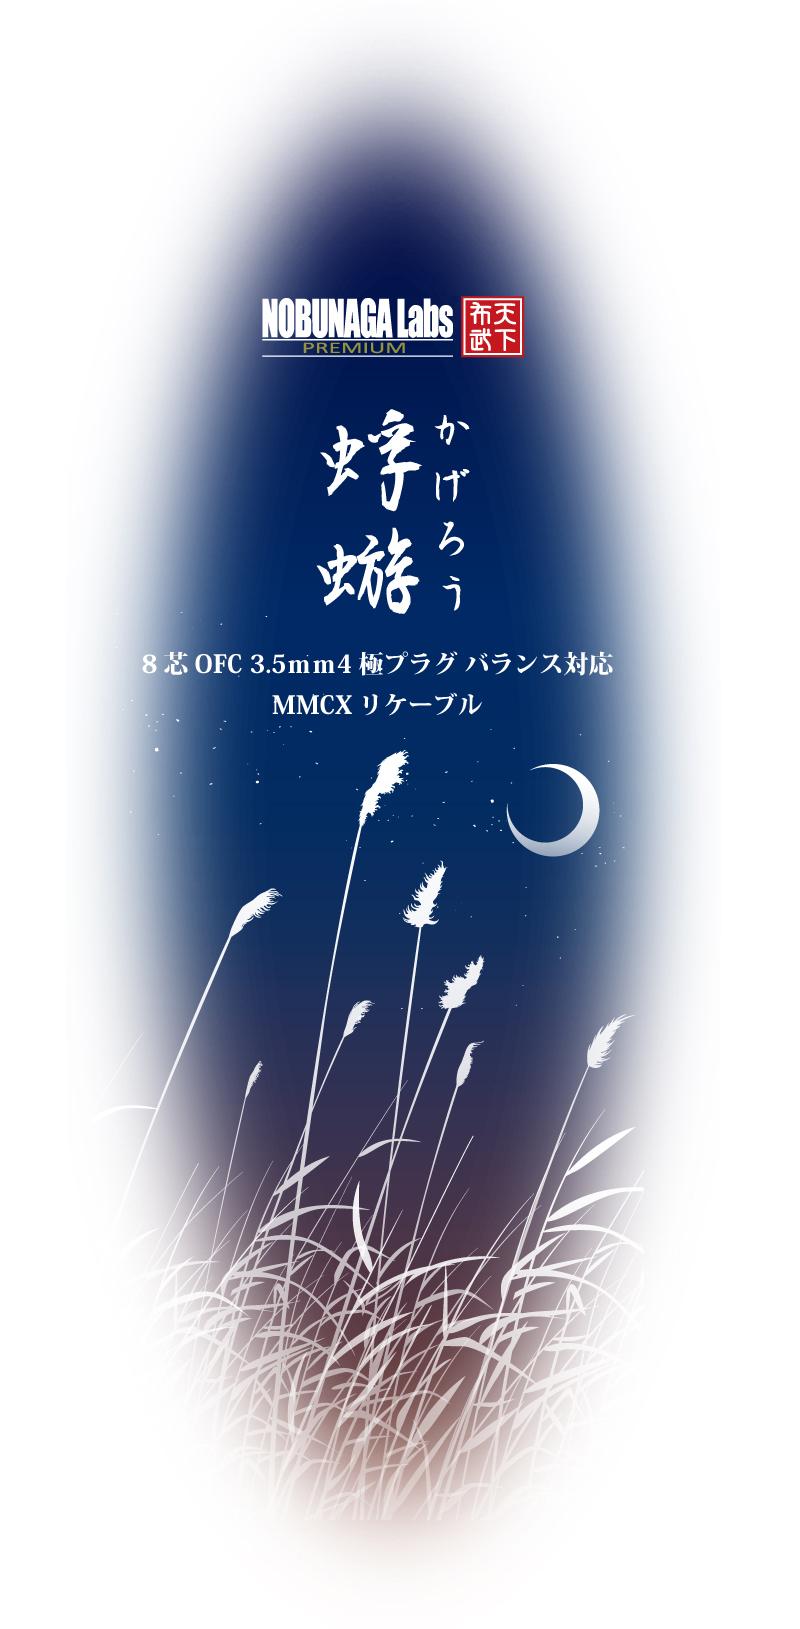 NOBUNAGA LABS PREMIUM 蜉蝣(かげろう) 3.5mm4極バランス出力プレイヤー用